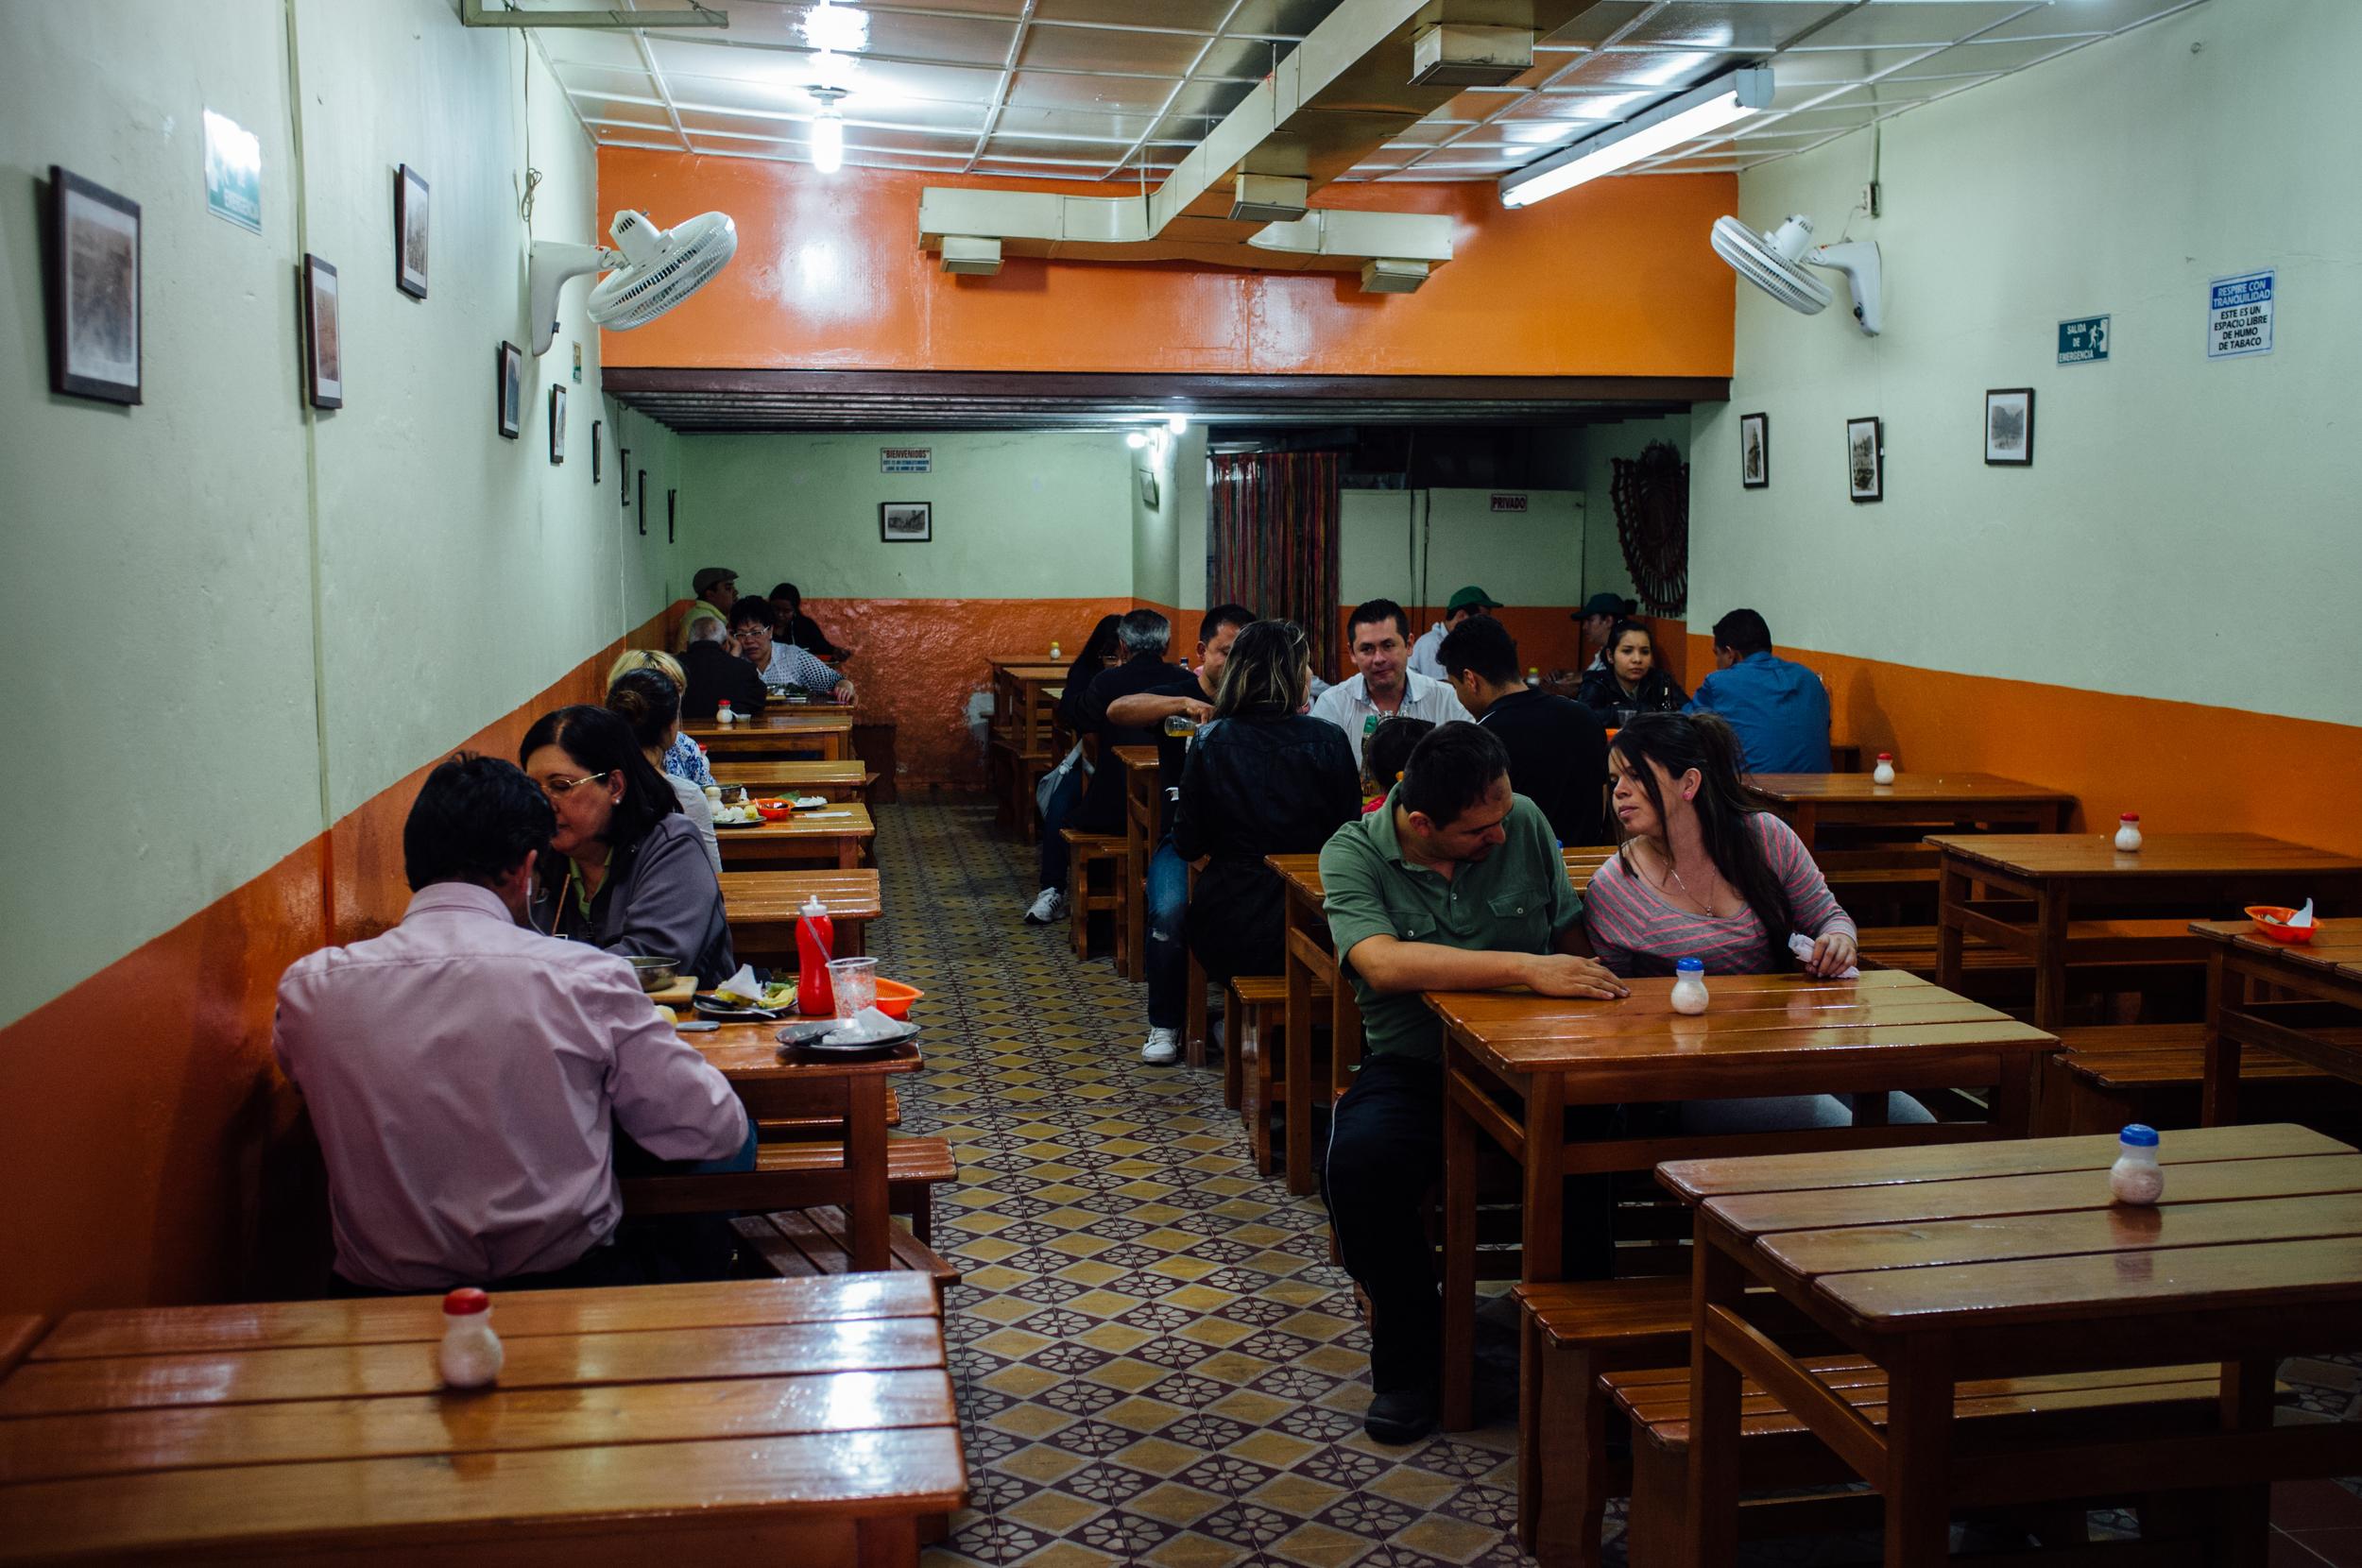 sopa de mondongo  restaurant